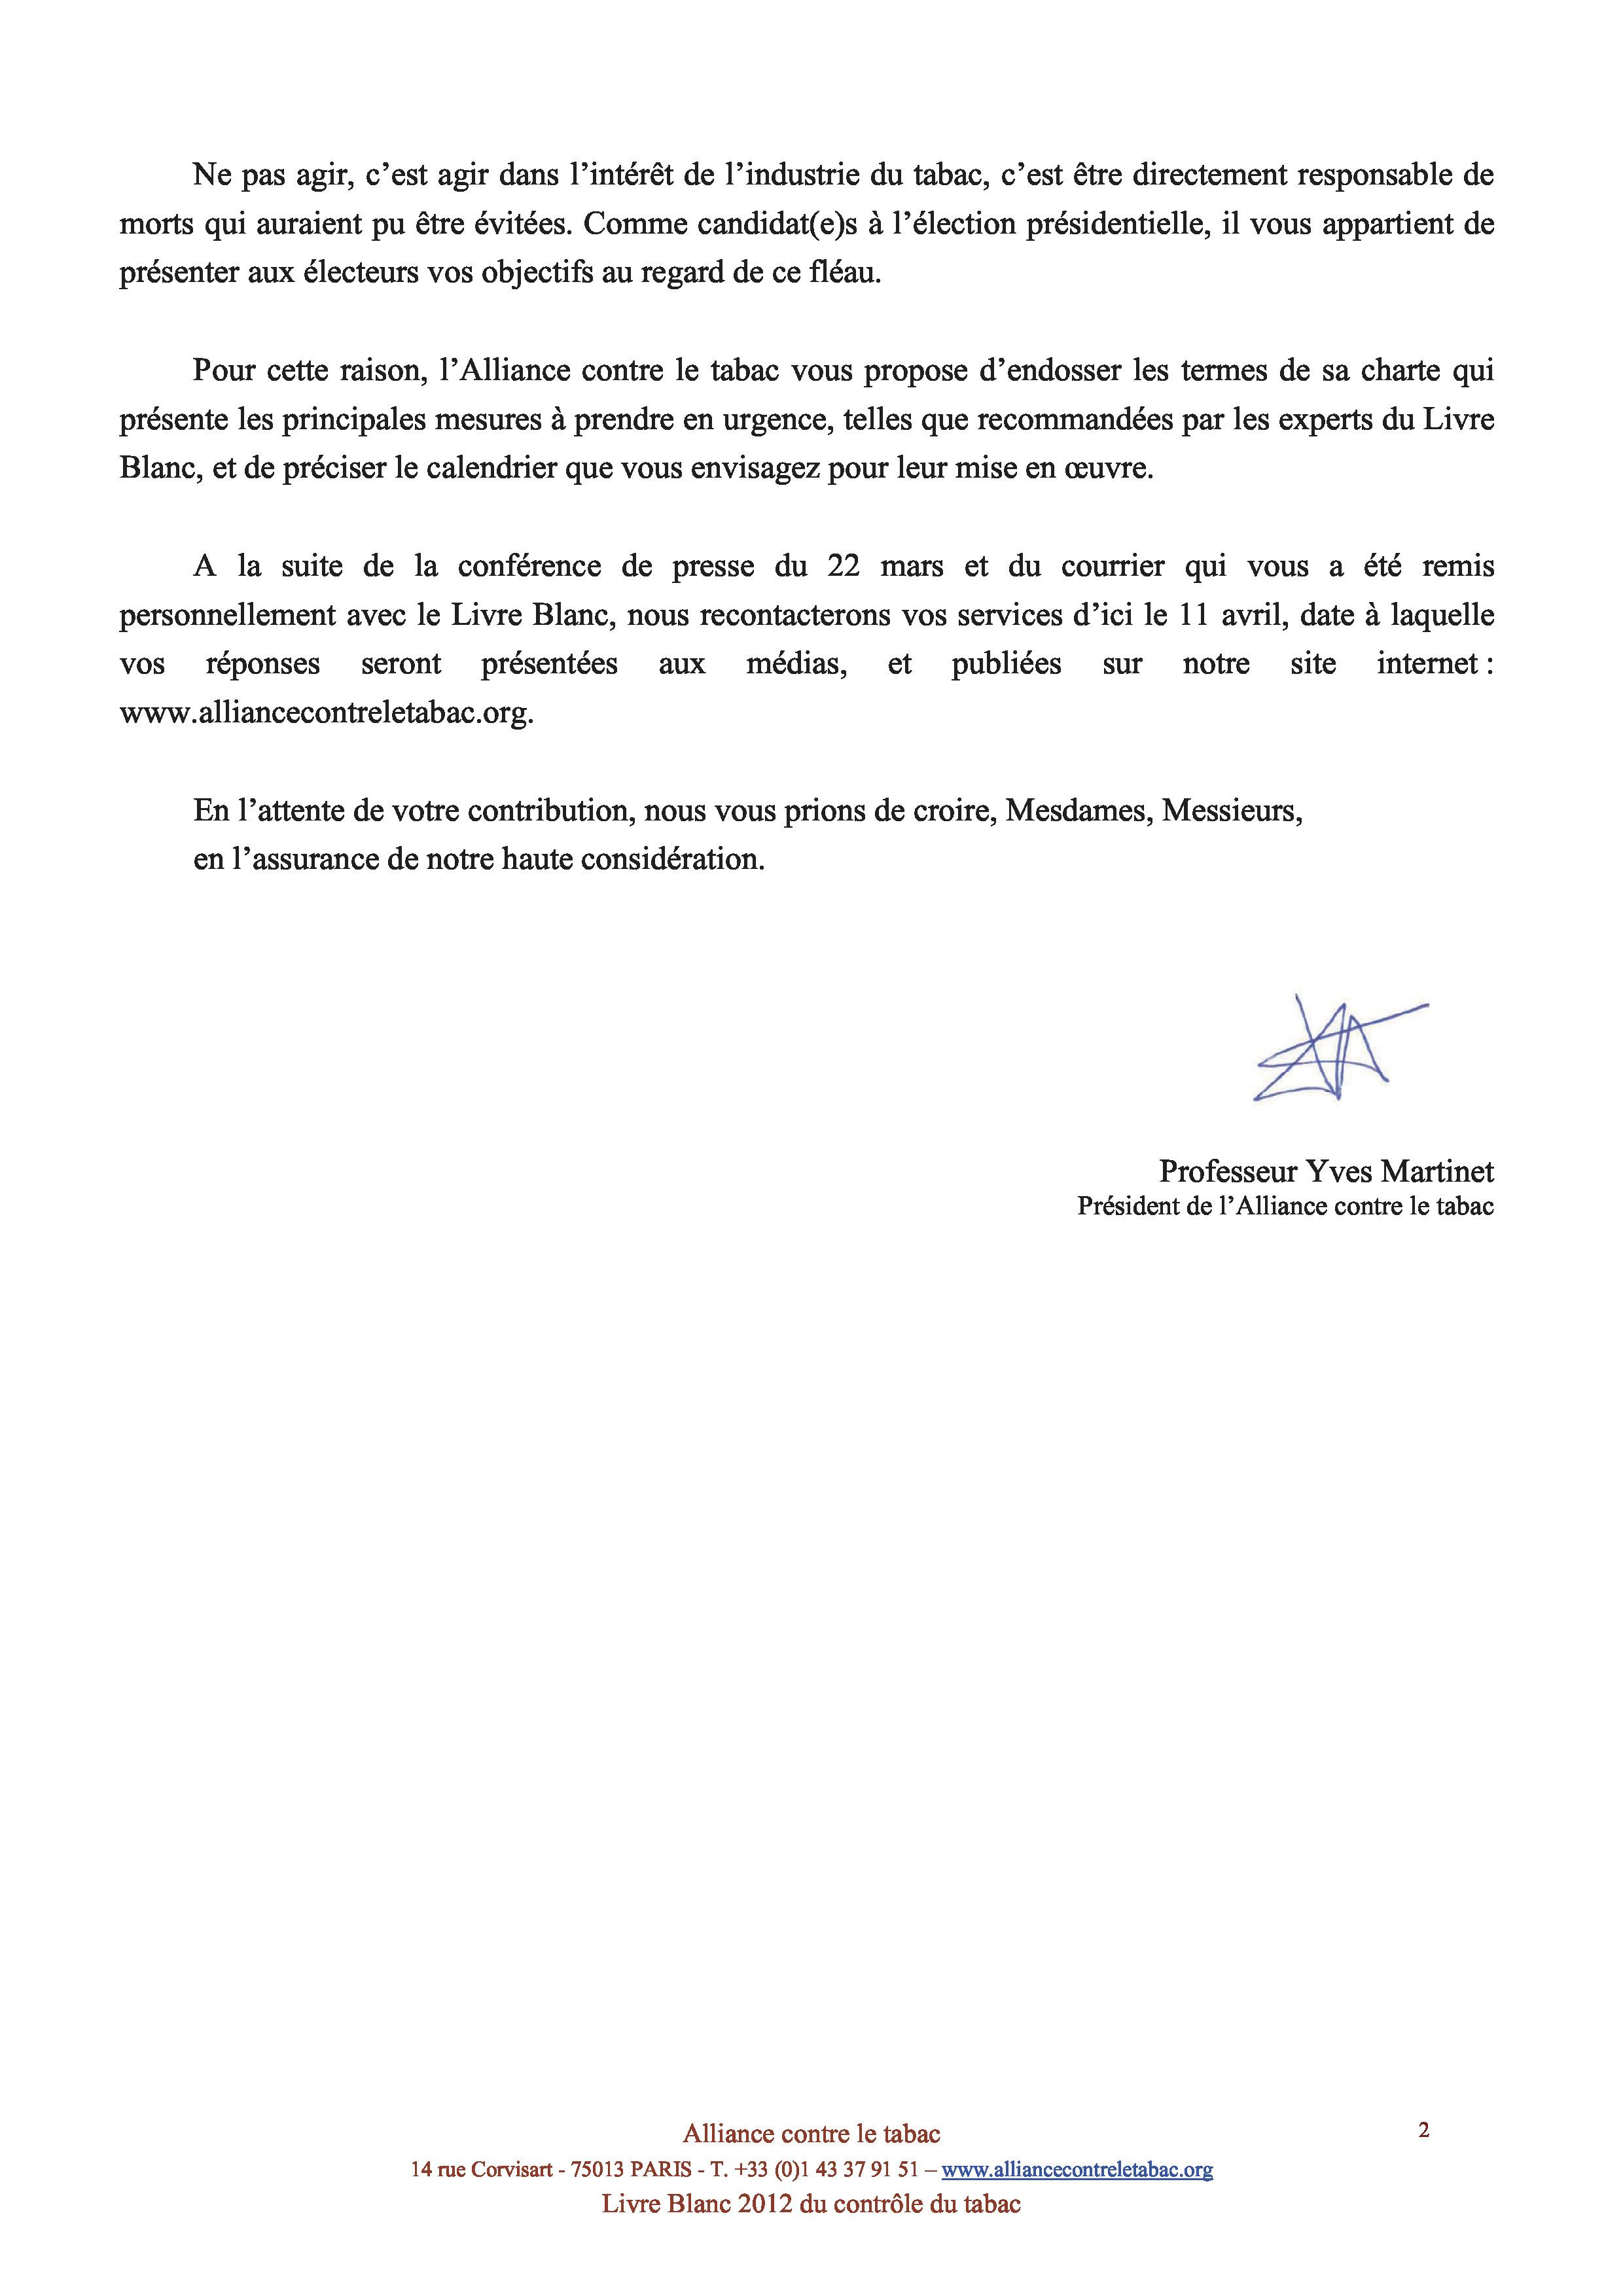 Alliance-dossier-presse-livre-blanc-11avr2012_Page_03.jpg